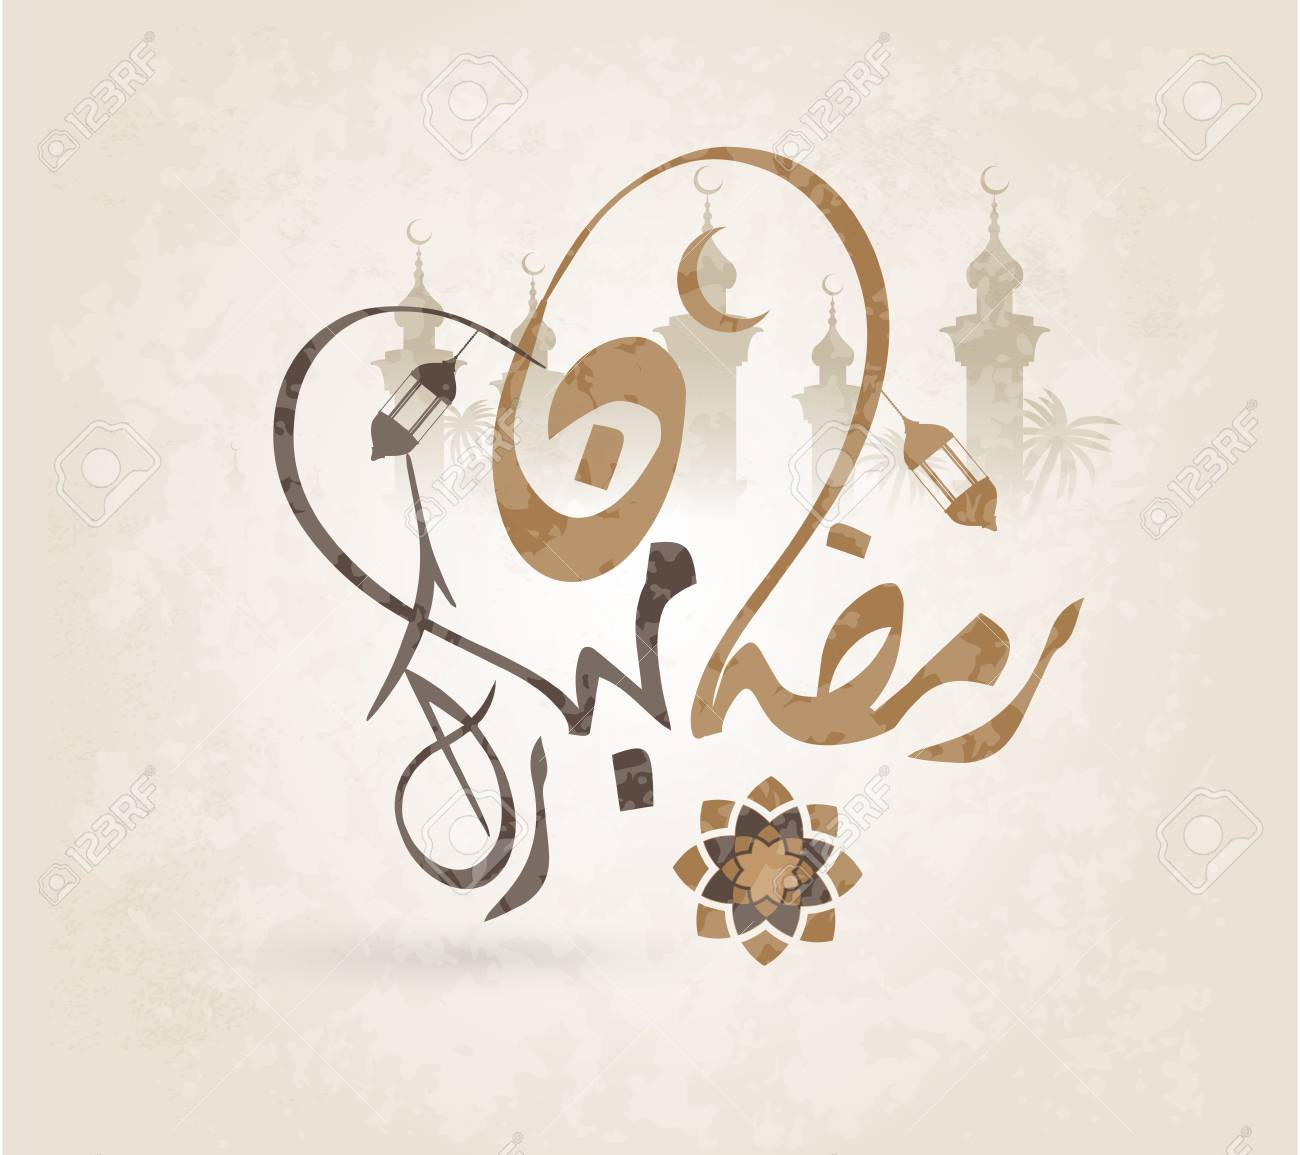 Ramadan kareem mubarak greeting cards in arabic style calligraphy ramadan kareem mubarak greeting cards in arabic style calligraphy translation generous ramadhan ramadhan m4hsunfo